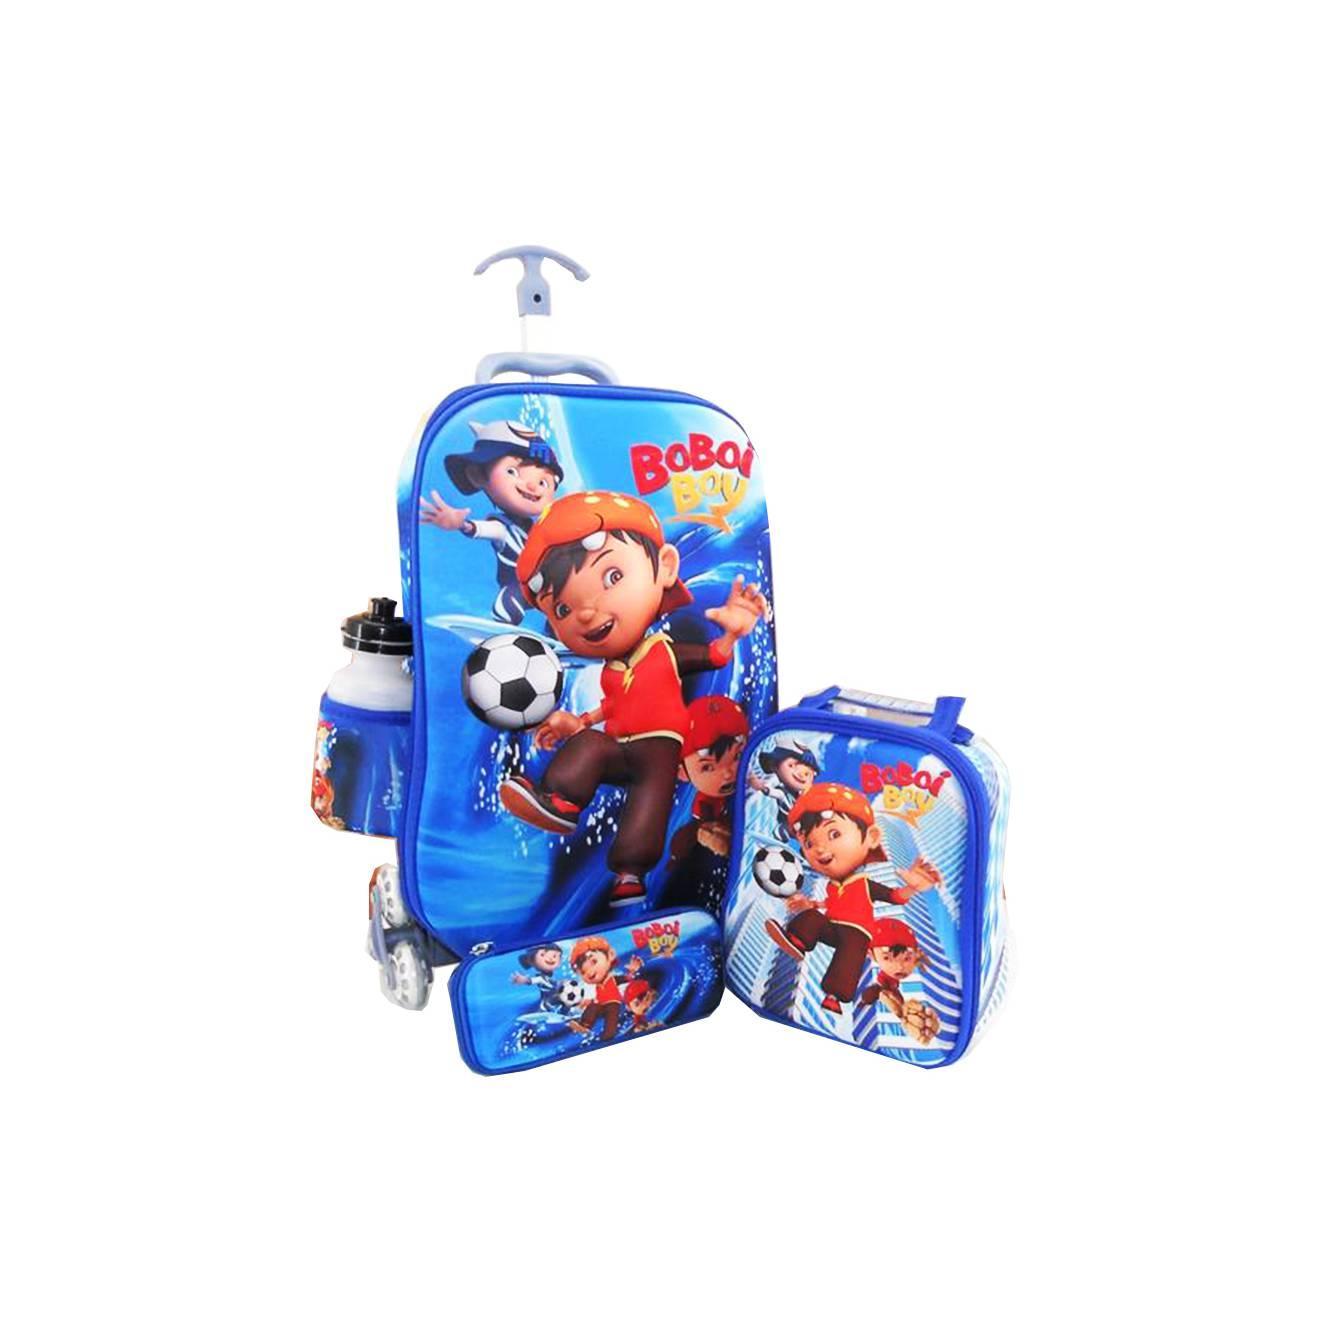 Trolley 4in1 Set 6 Roda Gagang Samurai Boboi Boy 3D Timbul - Blue